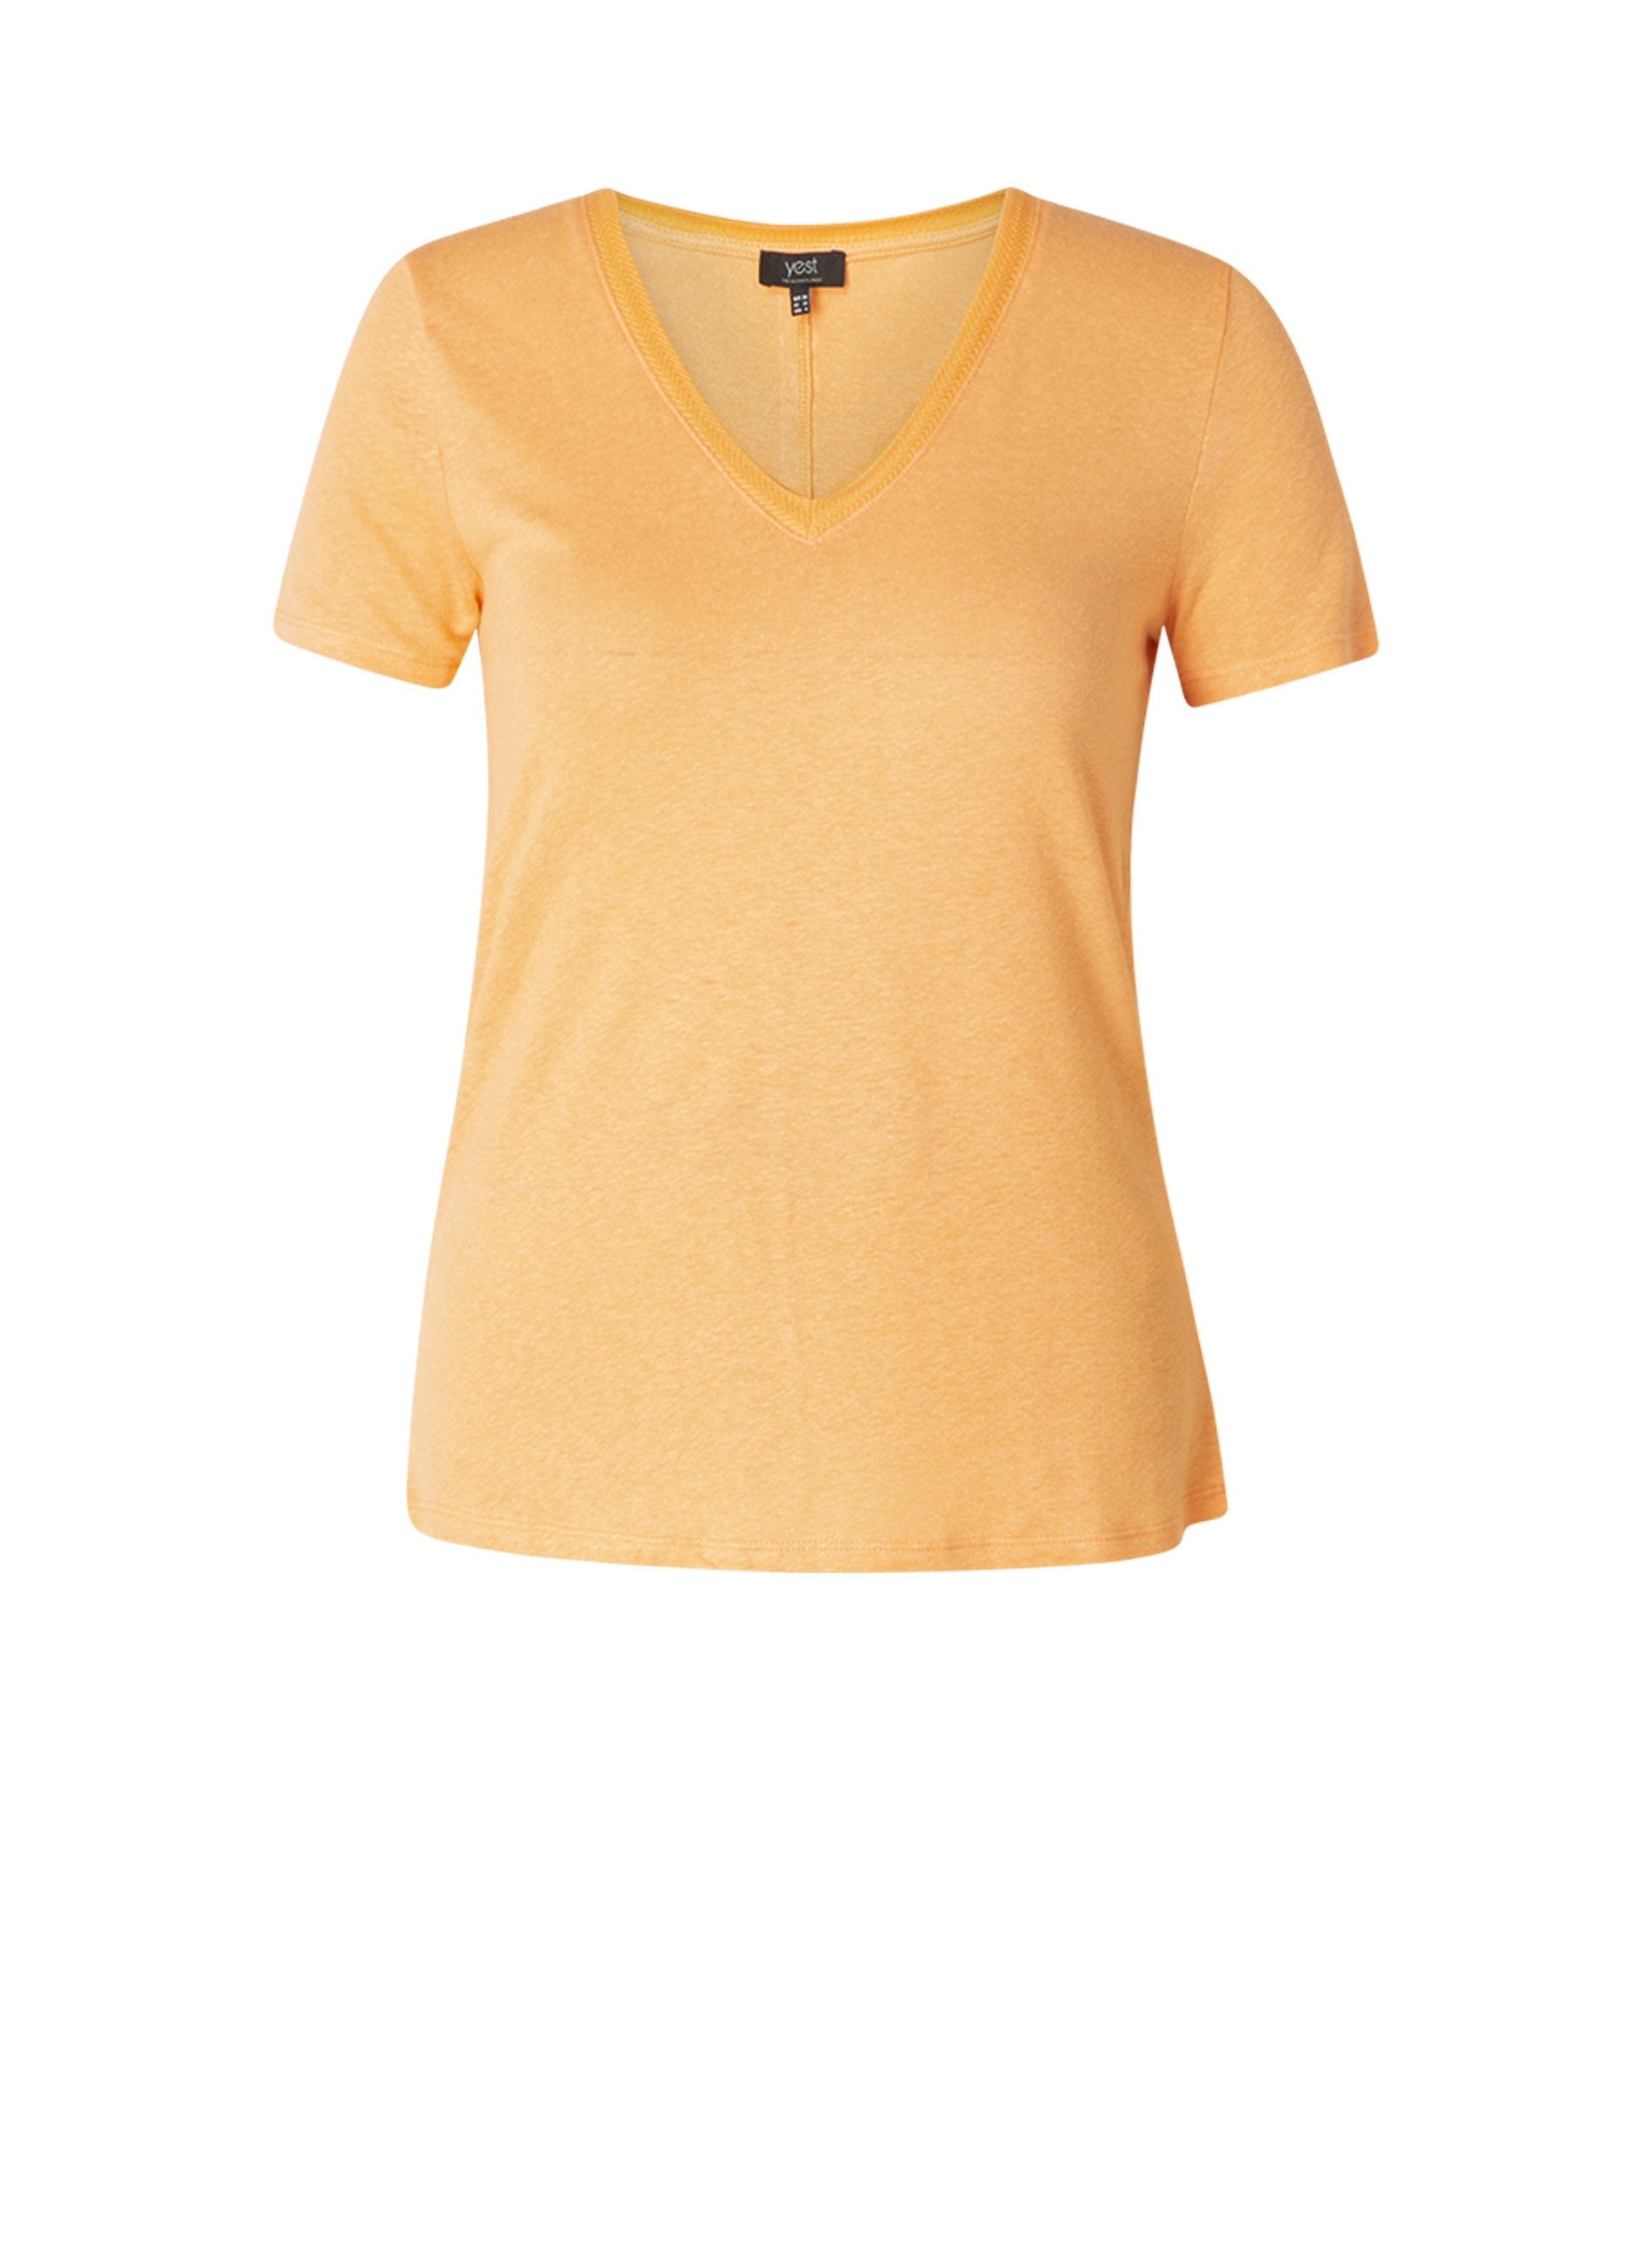 Yesta shirt Lieske 76 cm